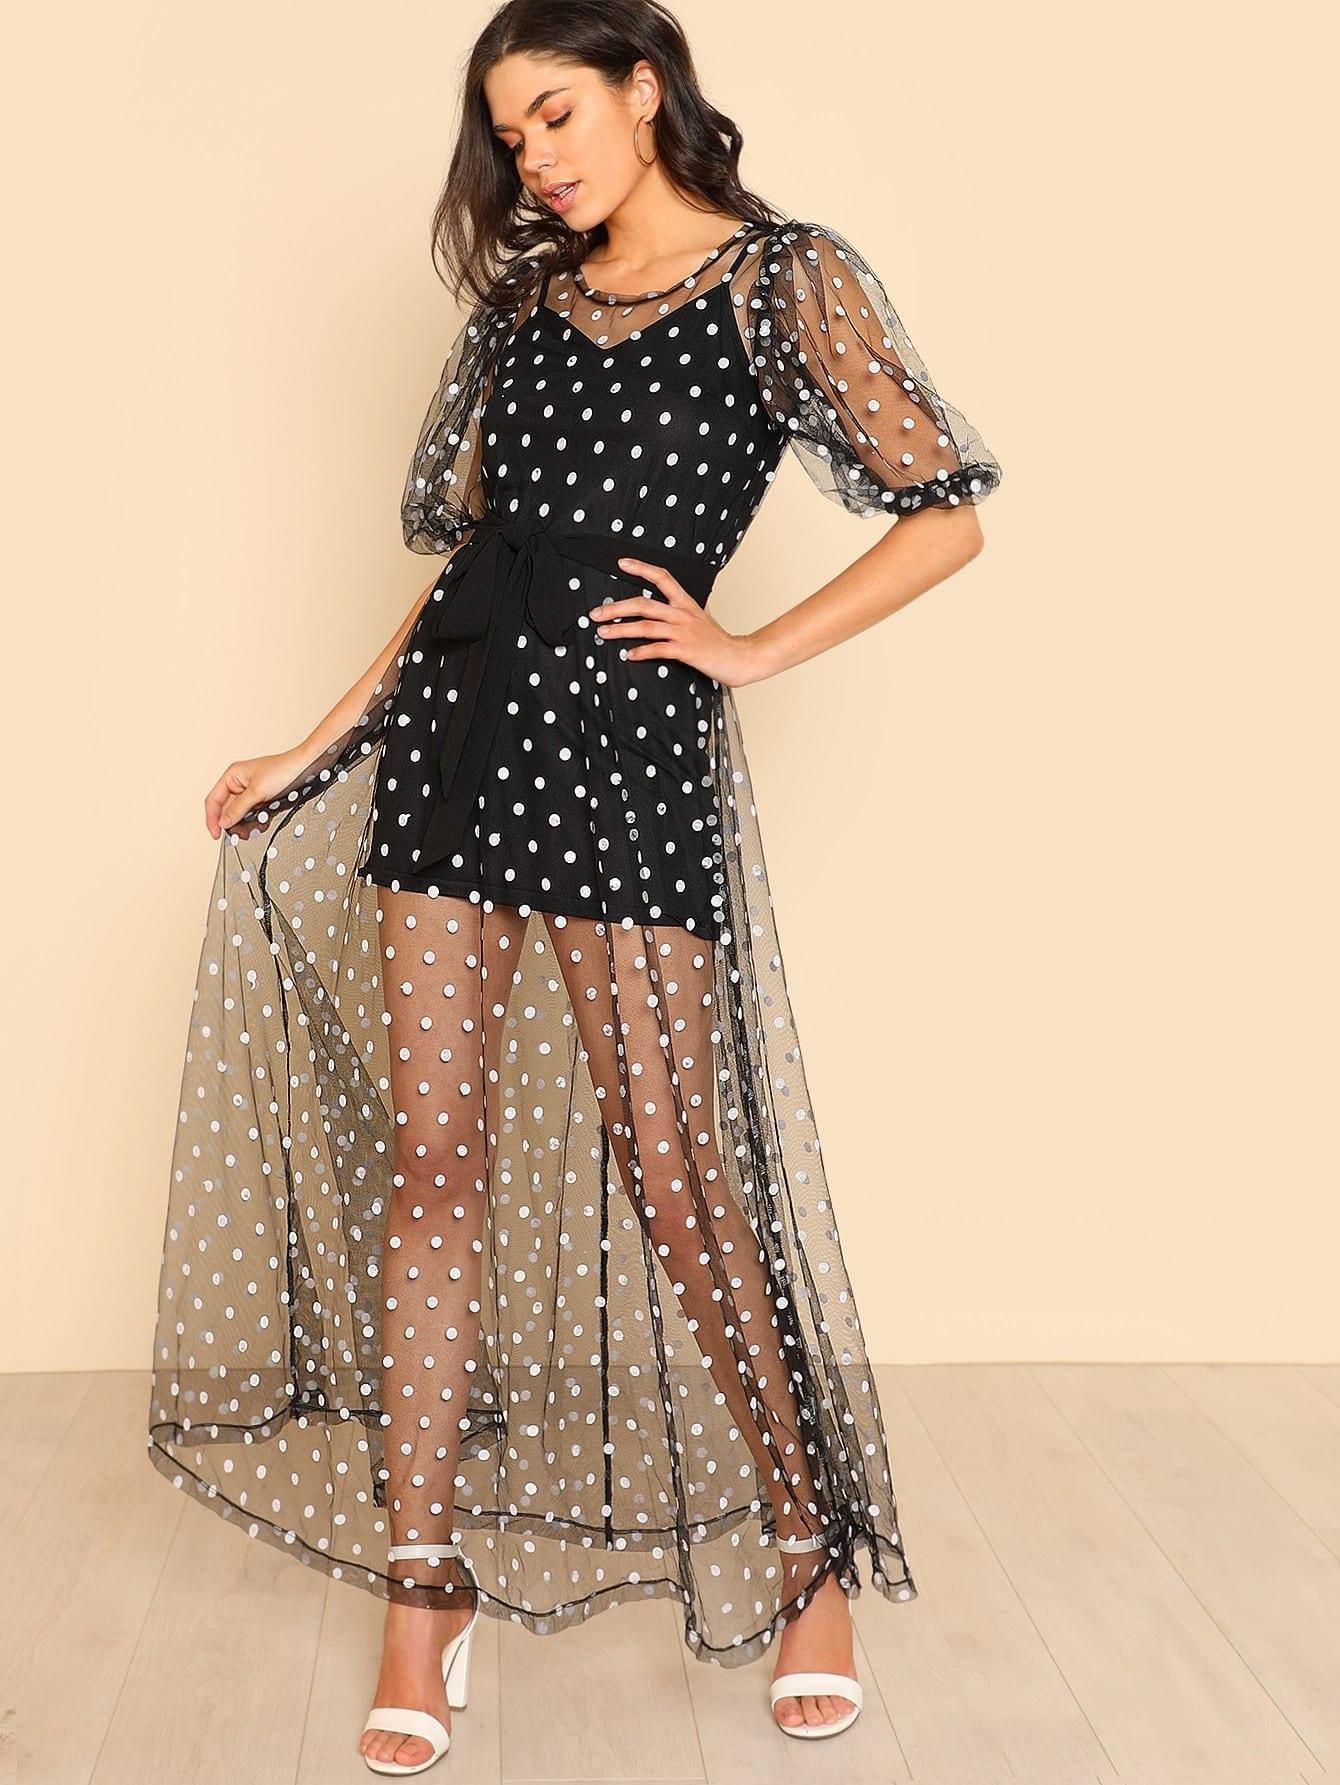 Polka Dot Tie Waist Sheer Mesh Dress Without Cami sheer mesh polka dot pants